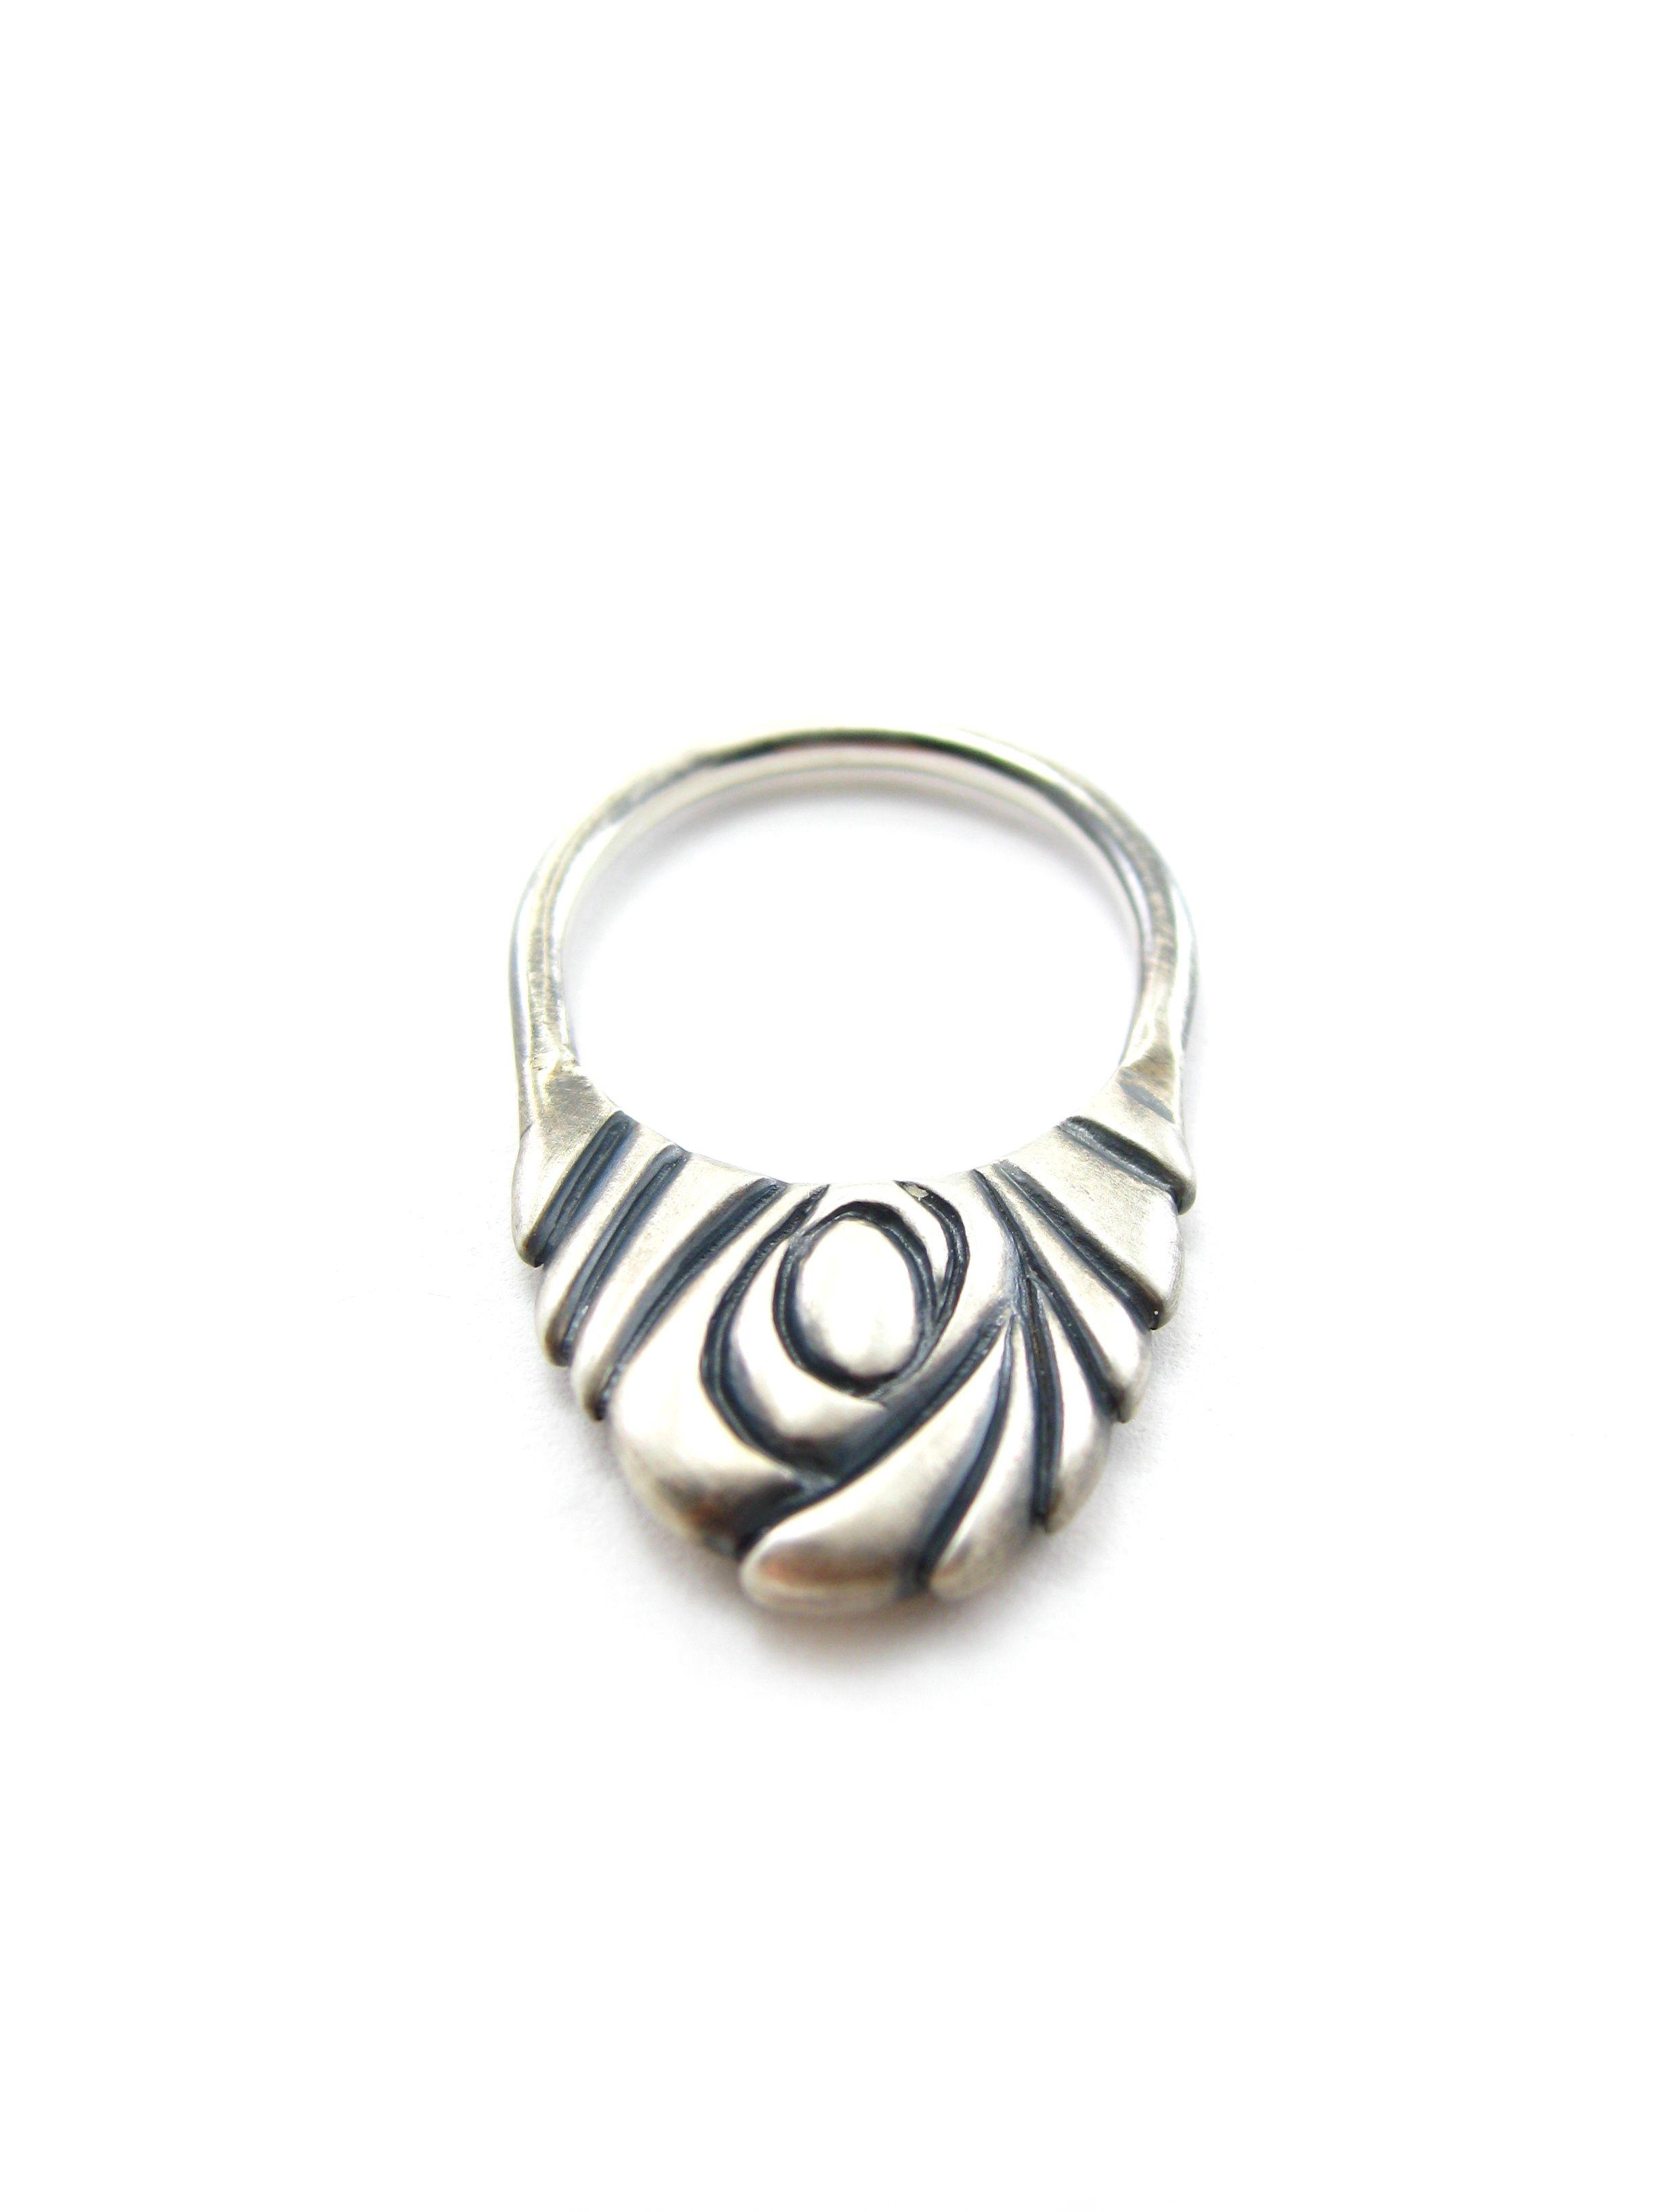 Swirling vortex ring - oxidized sterling silver - Sharon Z Jewelry